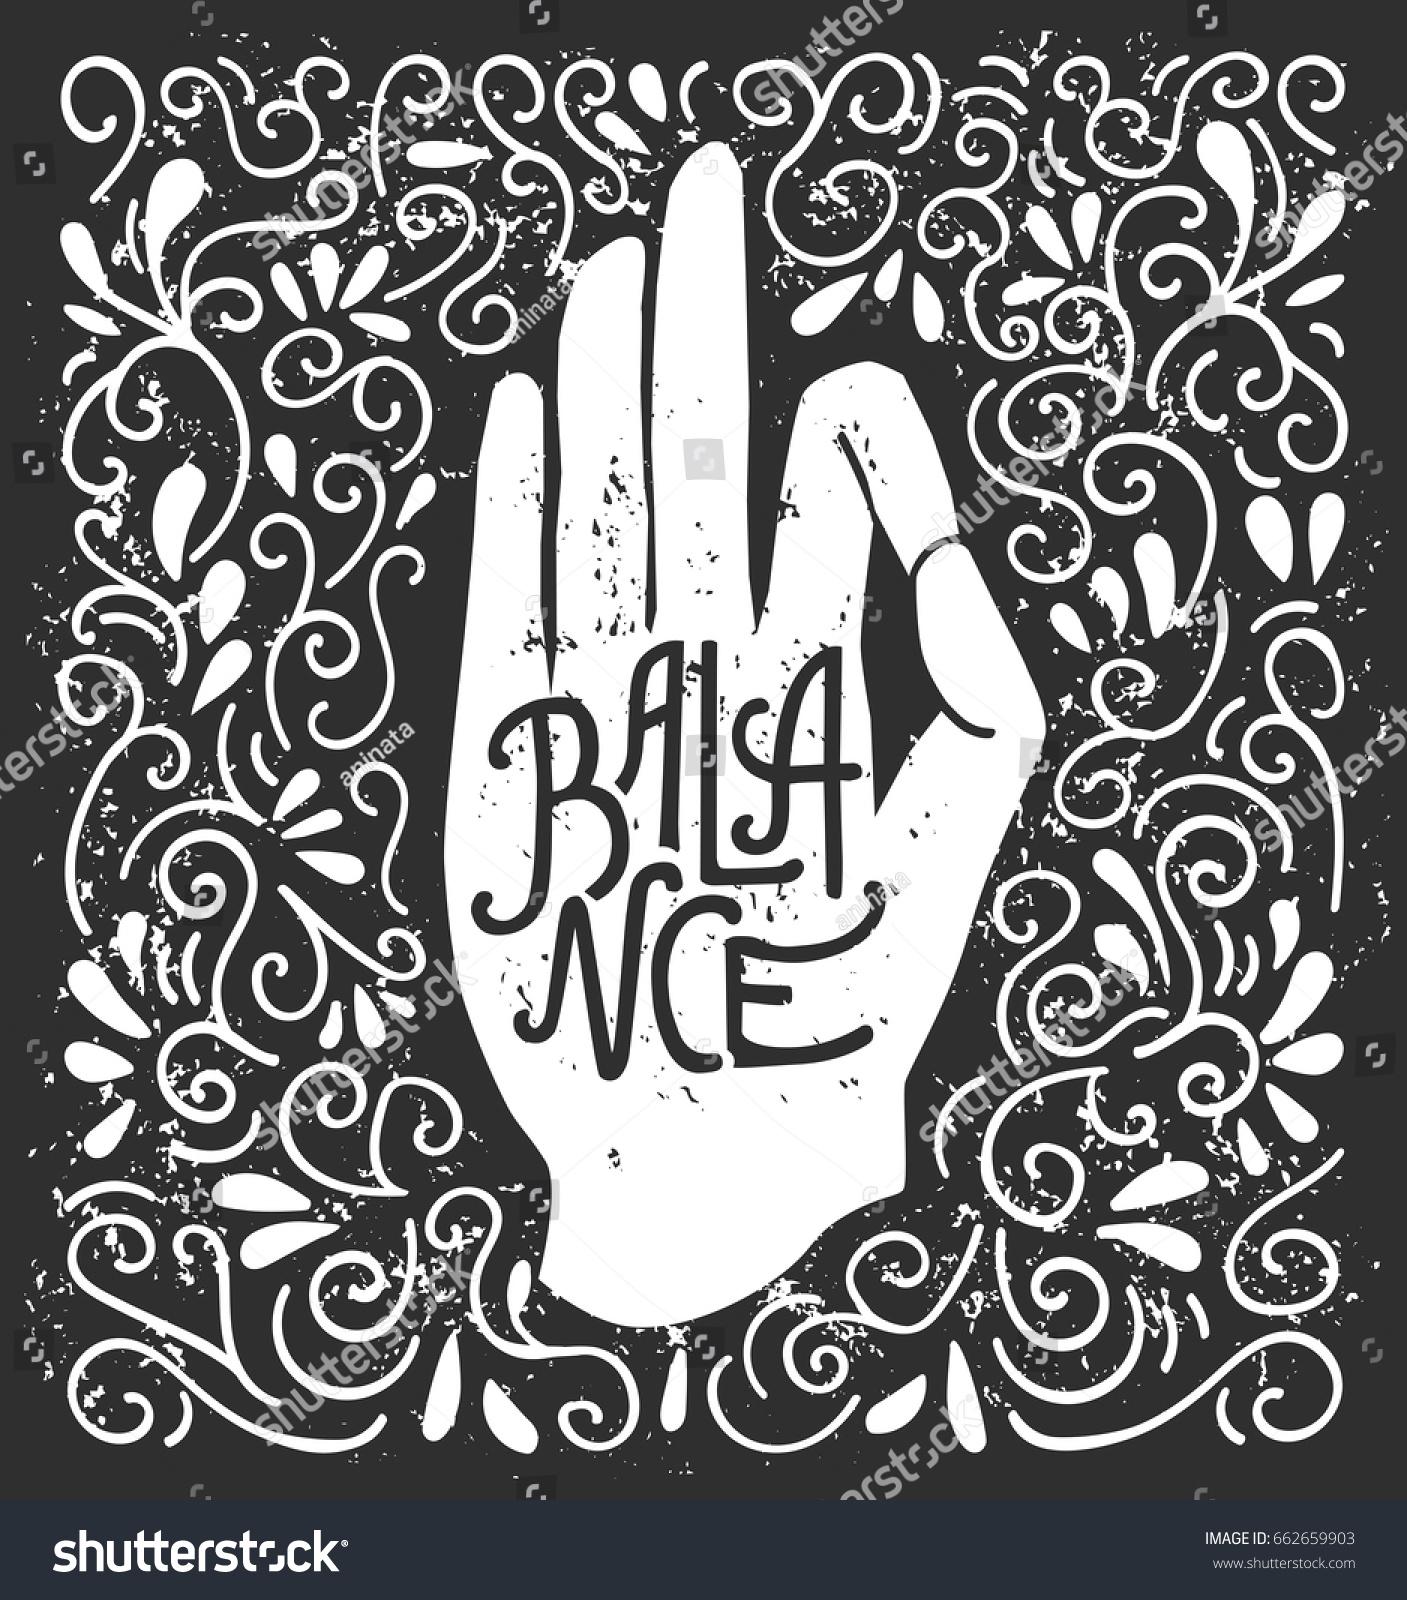 Balance Vector Illustration White Hand Silhouette Stock Vector ...